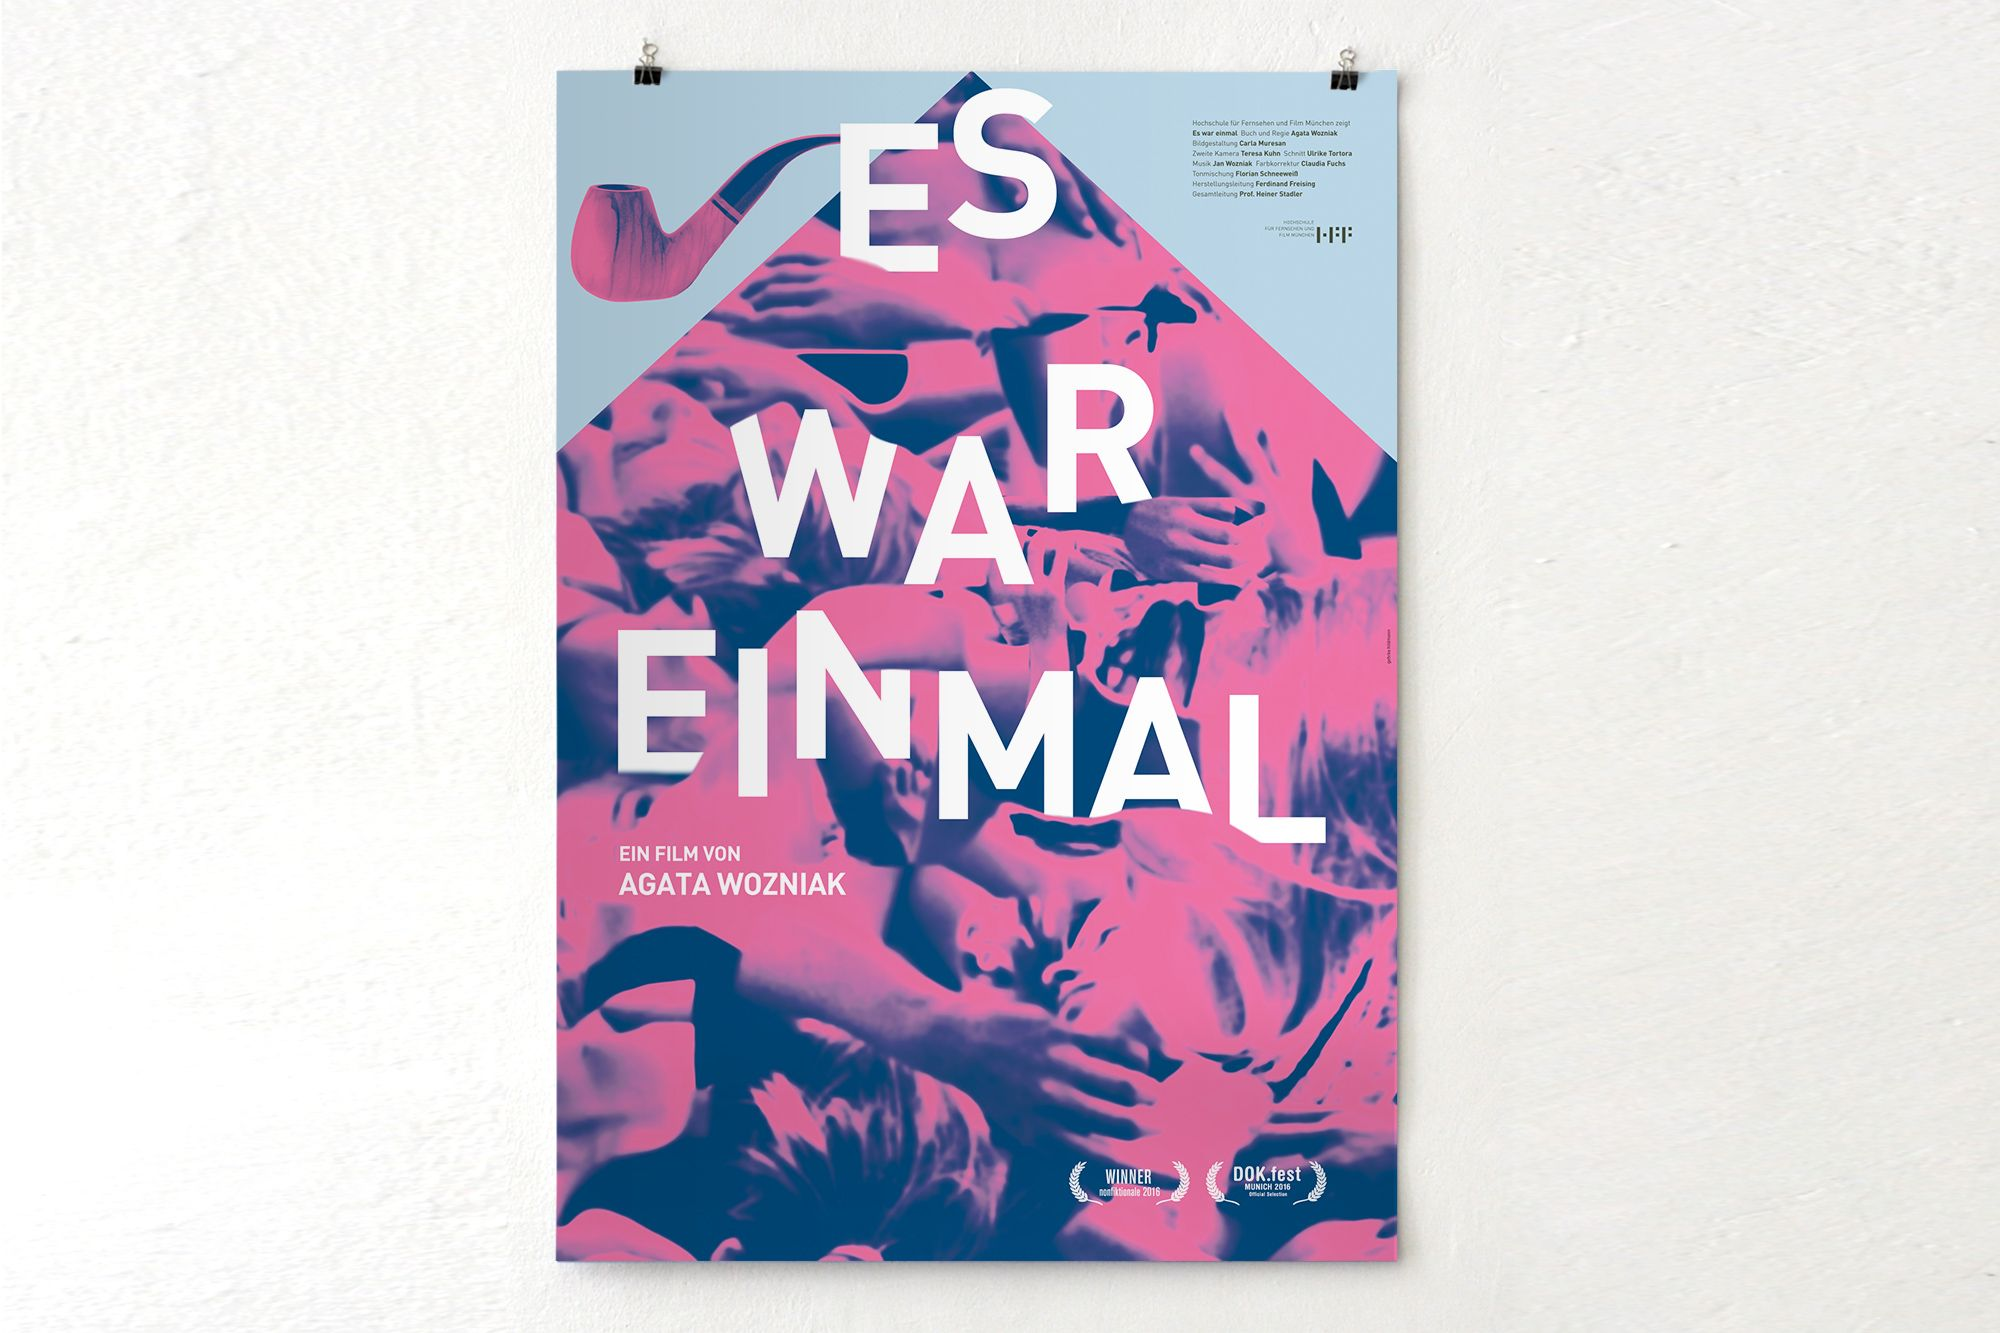 Plakat Ewe